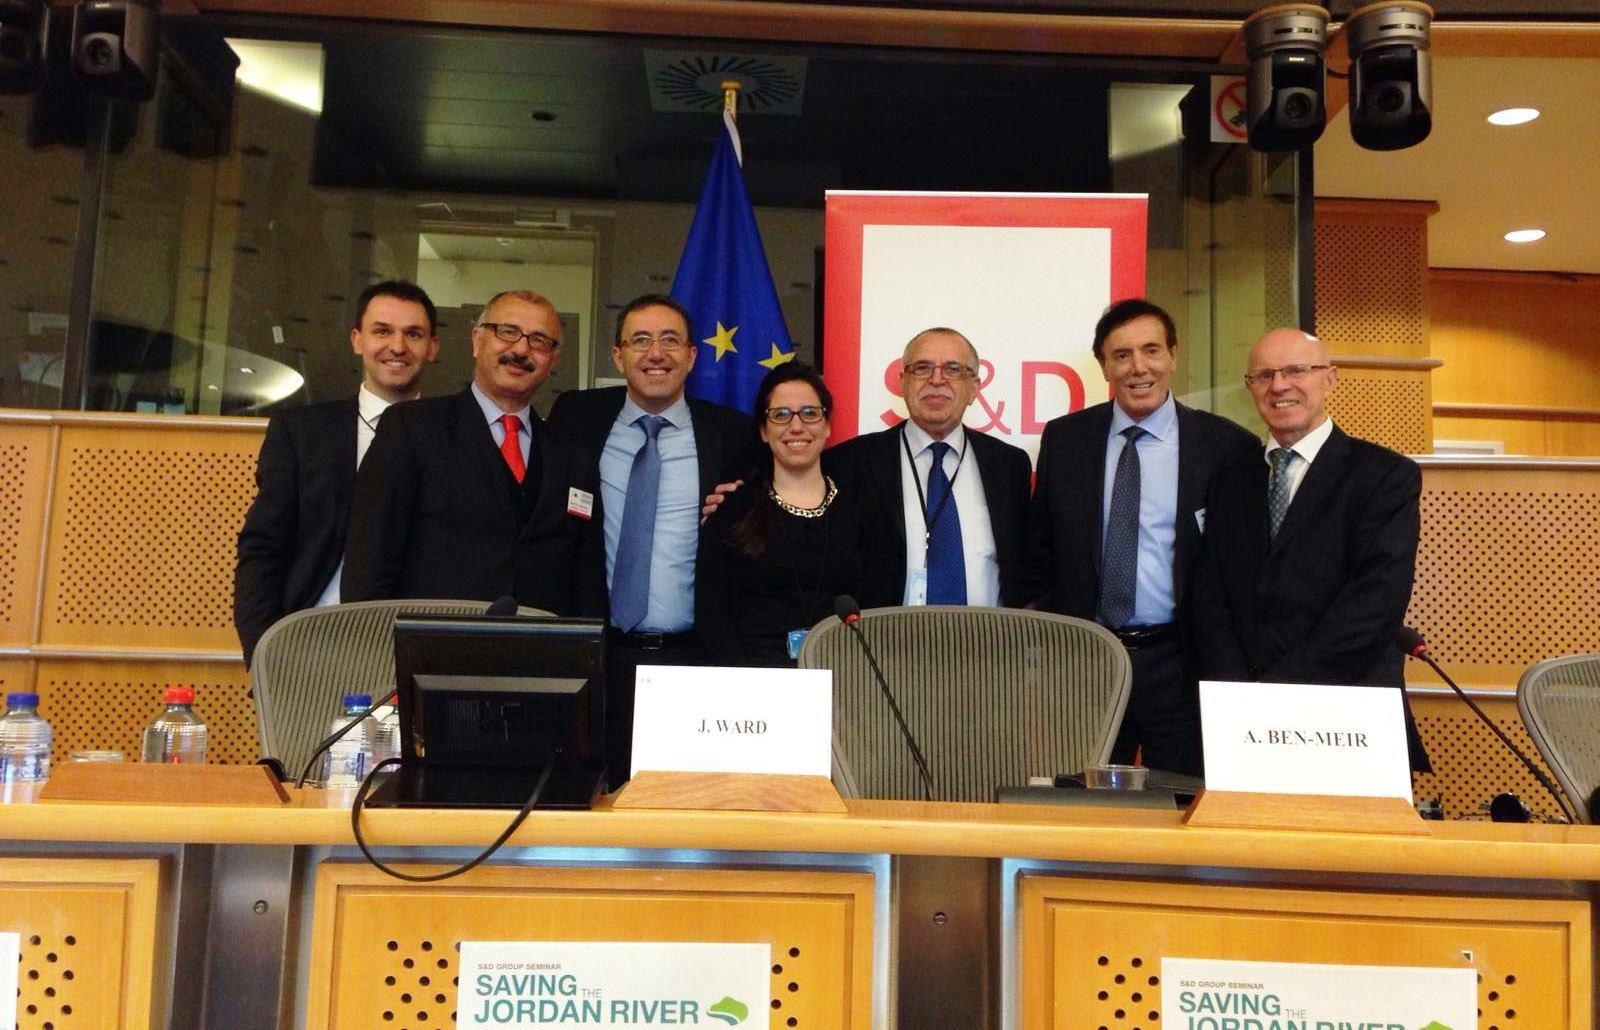 EU Parliament S&D group on Water